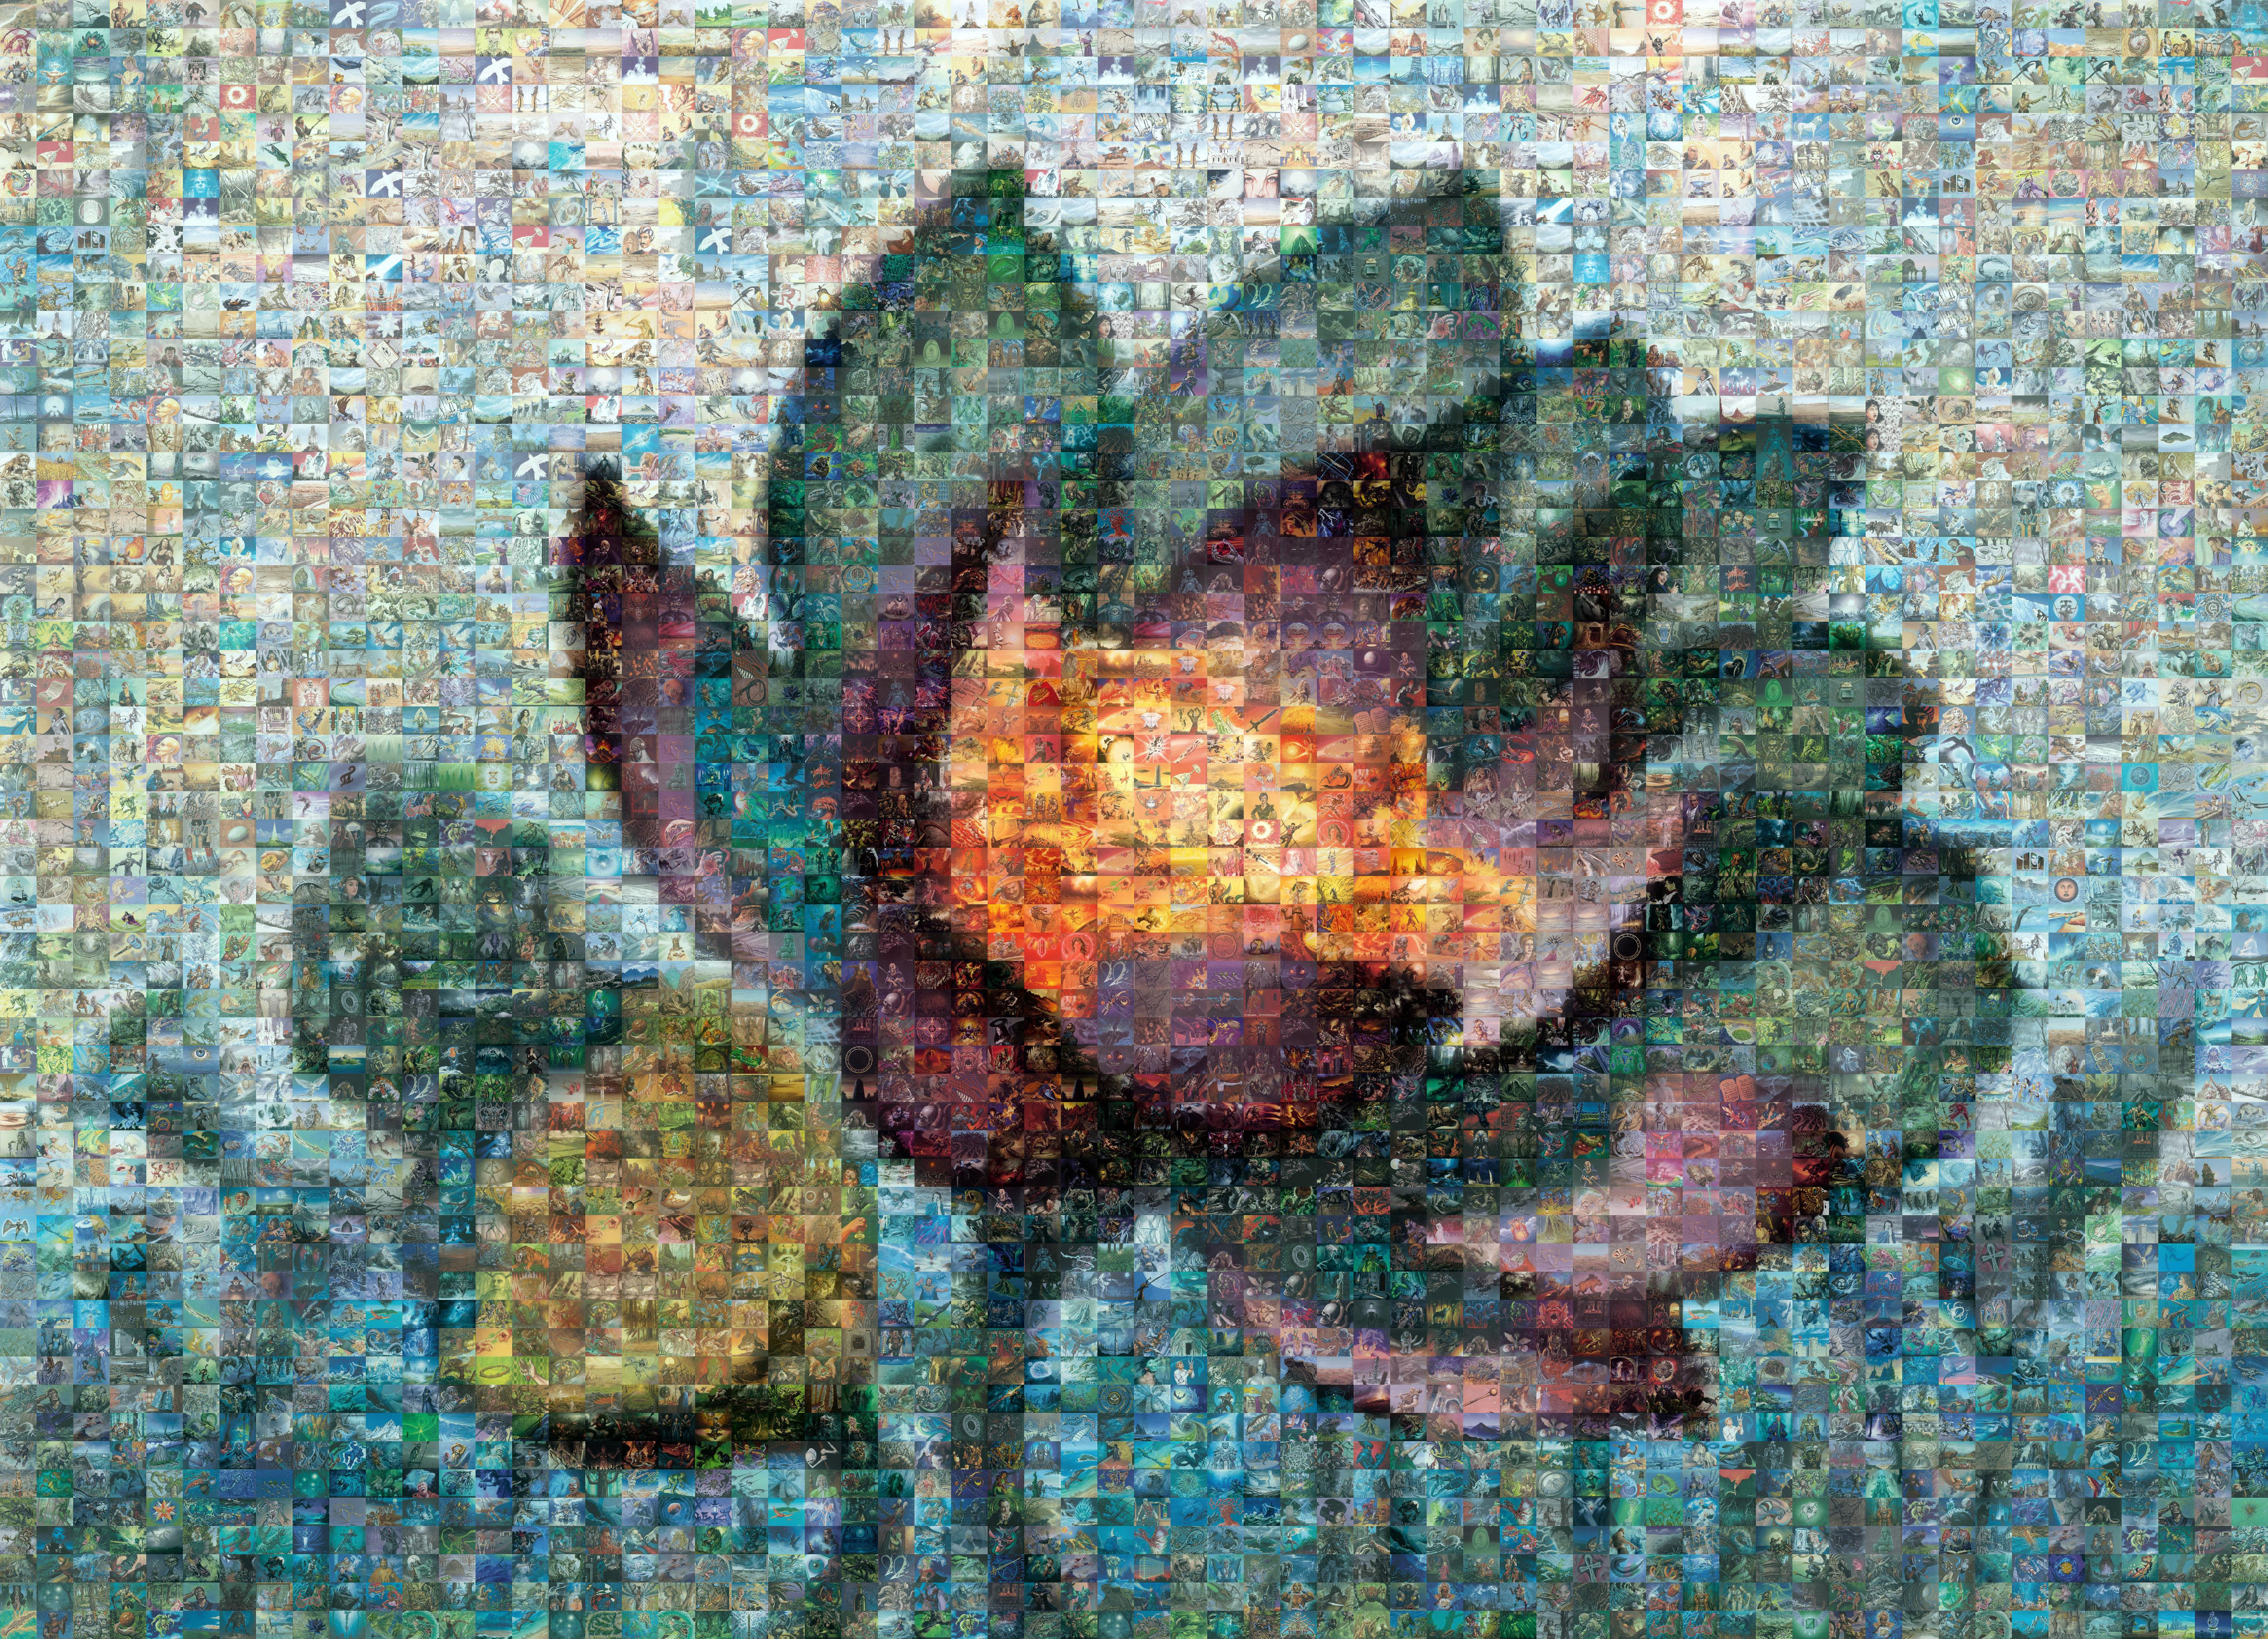 Mosaic A Week Lotus Bloom Plaid Spots